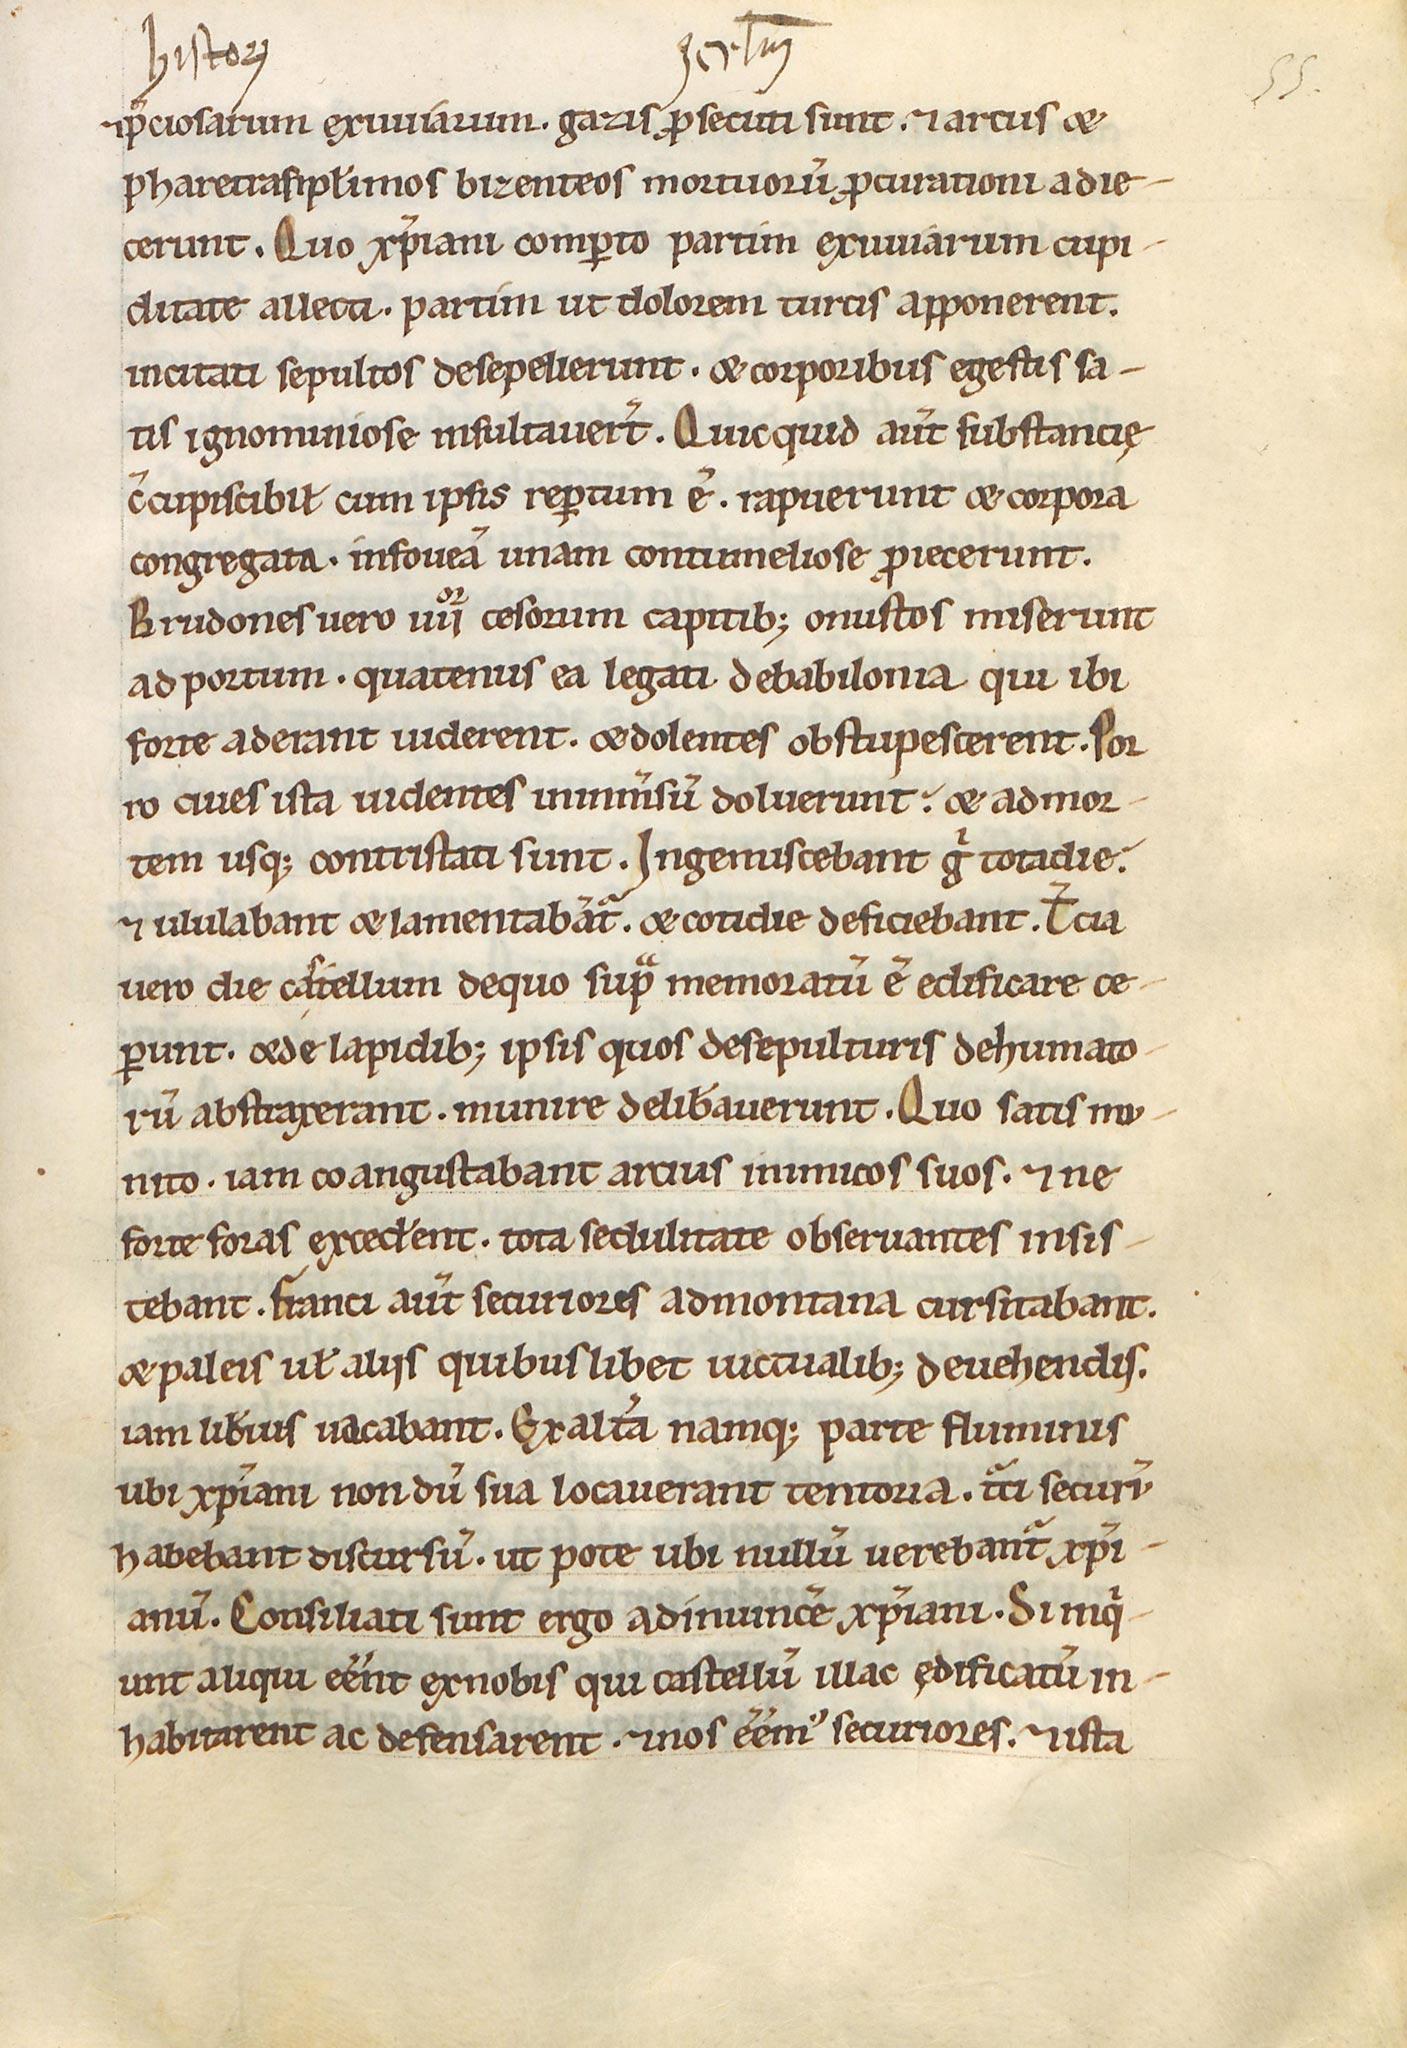 Manuscrit-Historia-Hierosolimitana-55r°